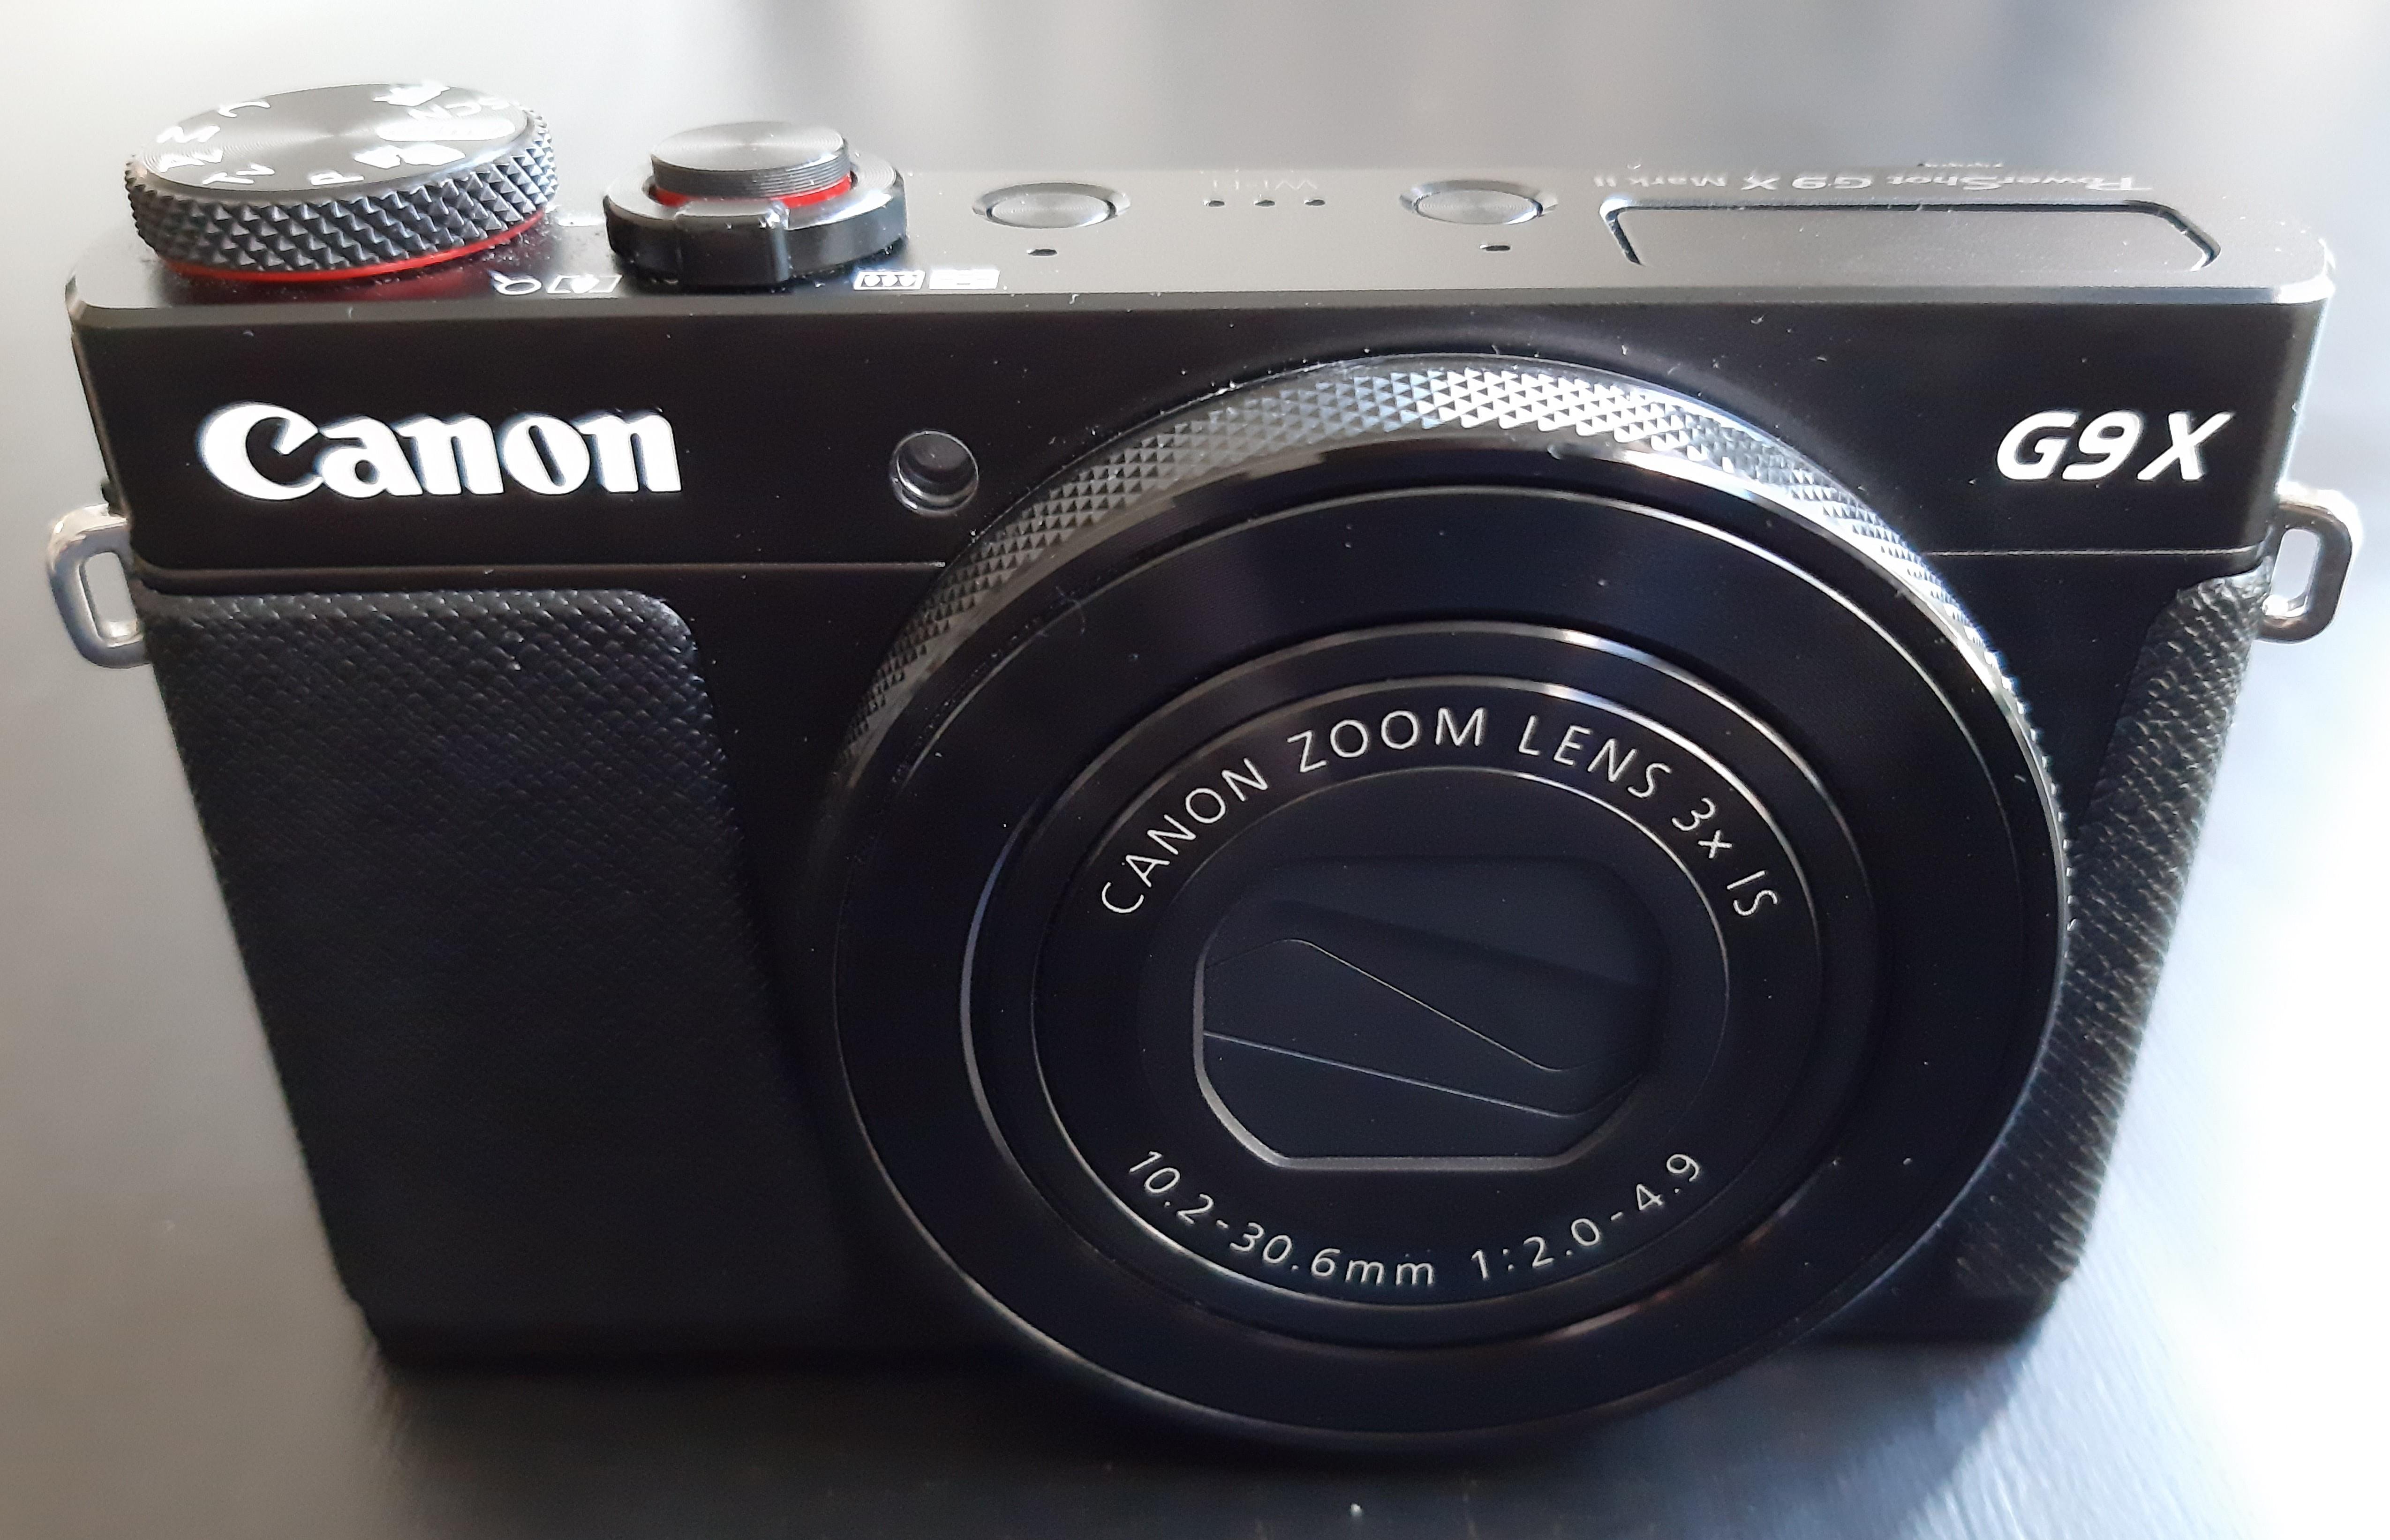 Canon Powershot G9 X Mark II – Wikipedia